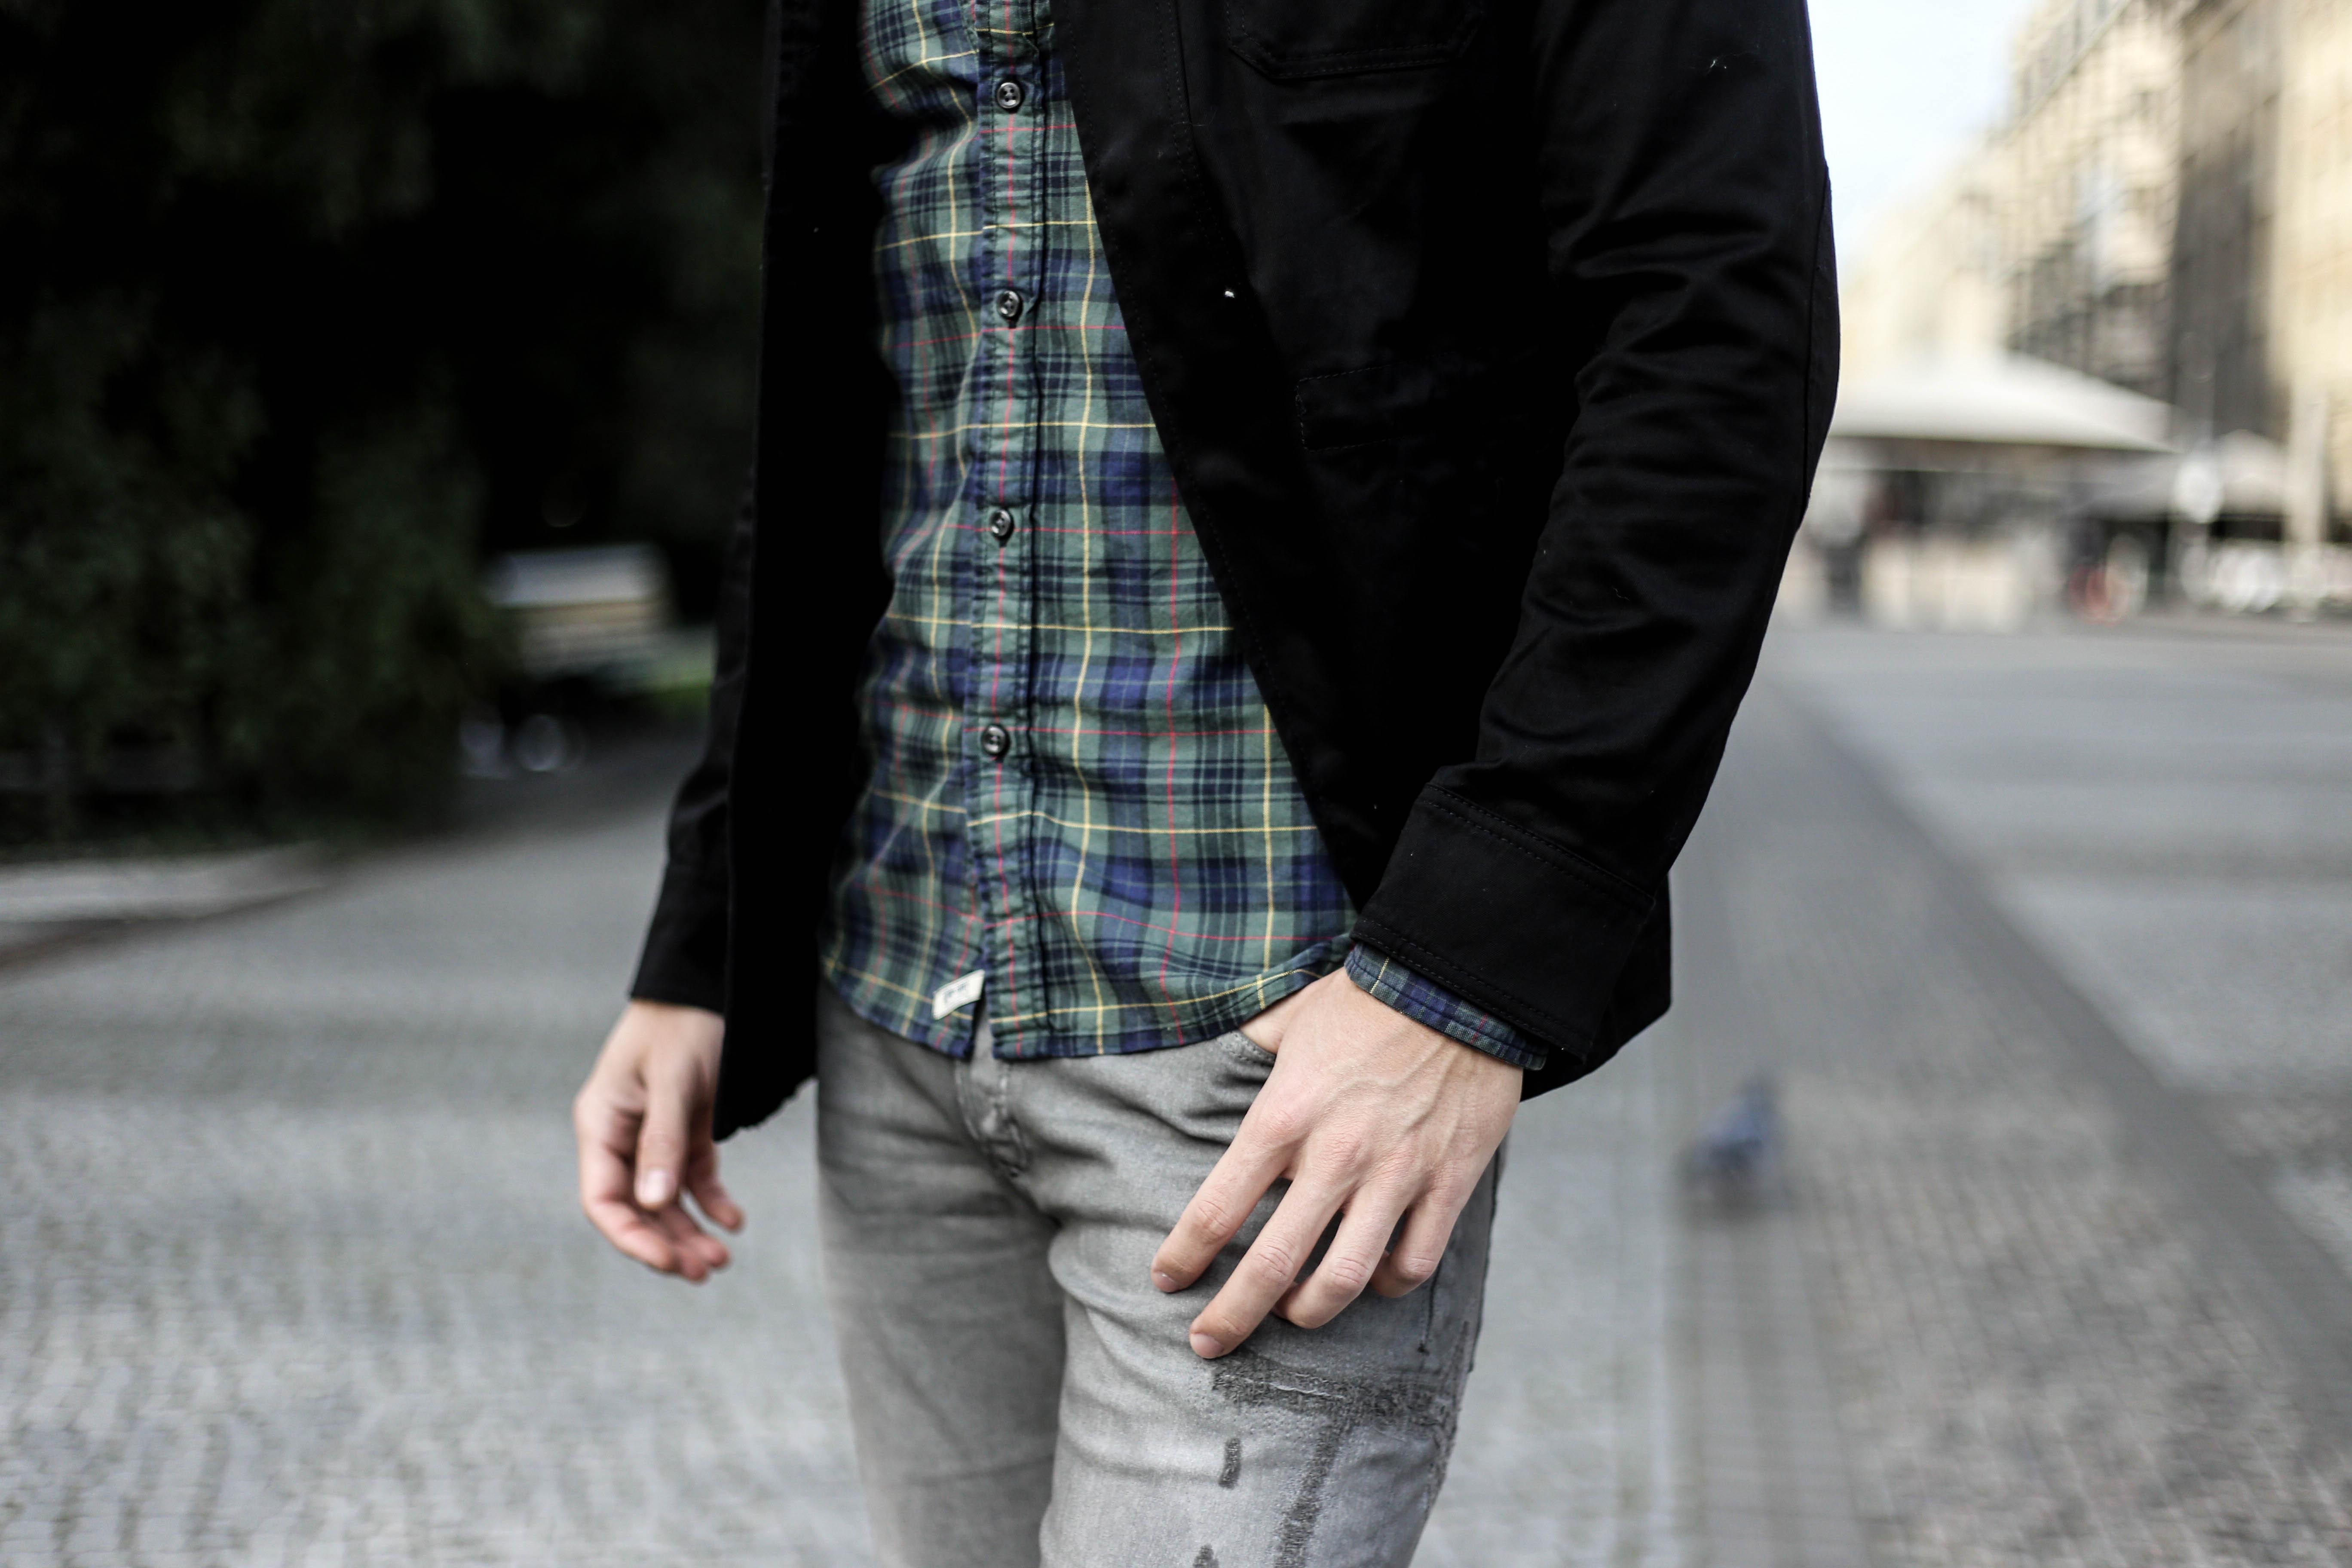 kariertes-hemd-maennerblog-fashionblog-berlin-outfit-graue-jeans_4116